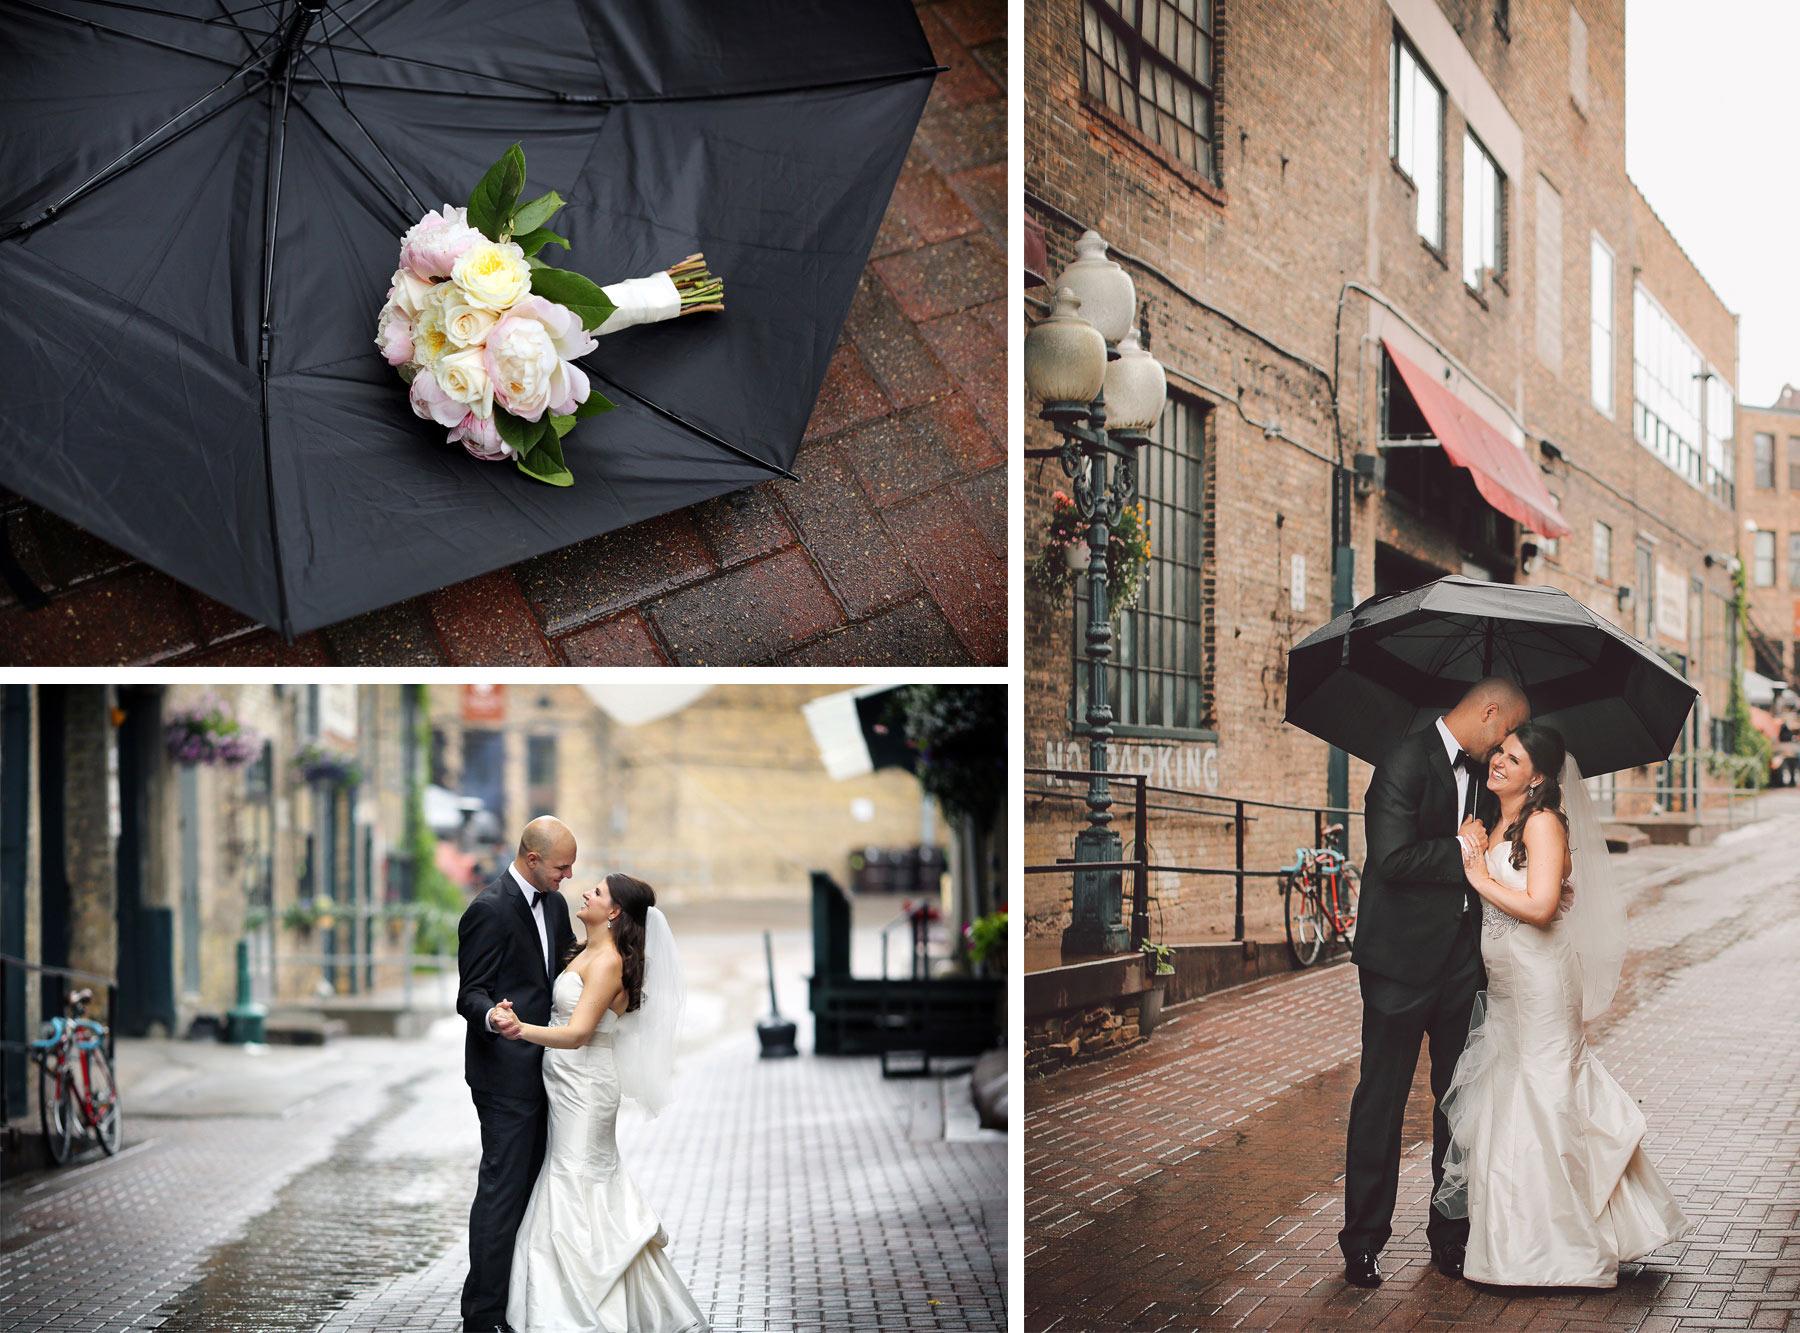 11-Minneapolis-Minnesota-Wedding-Photography-by-Vick-Photography-Rain-Umbrella-Downtown-Industrial-Brick-Nikki-and-Matt.jpg